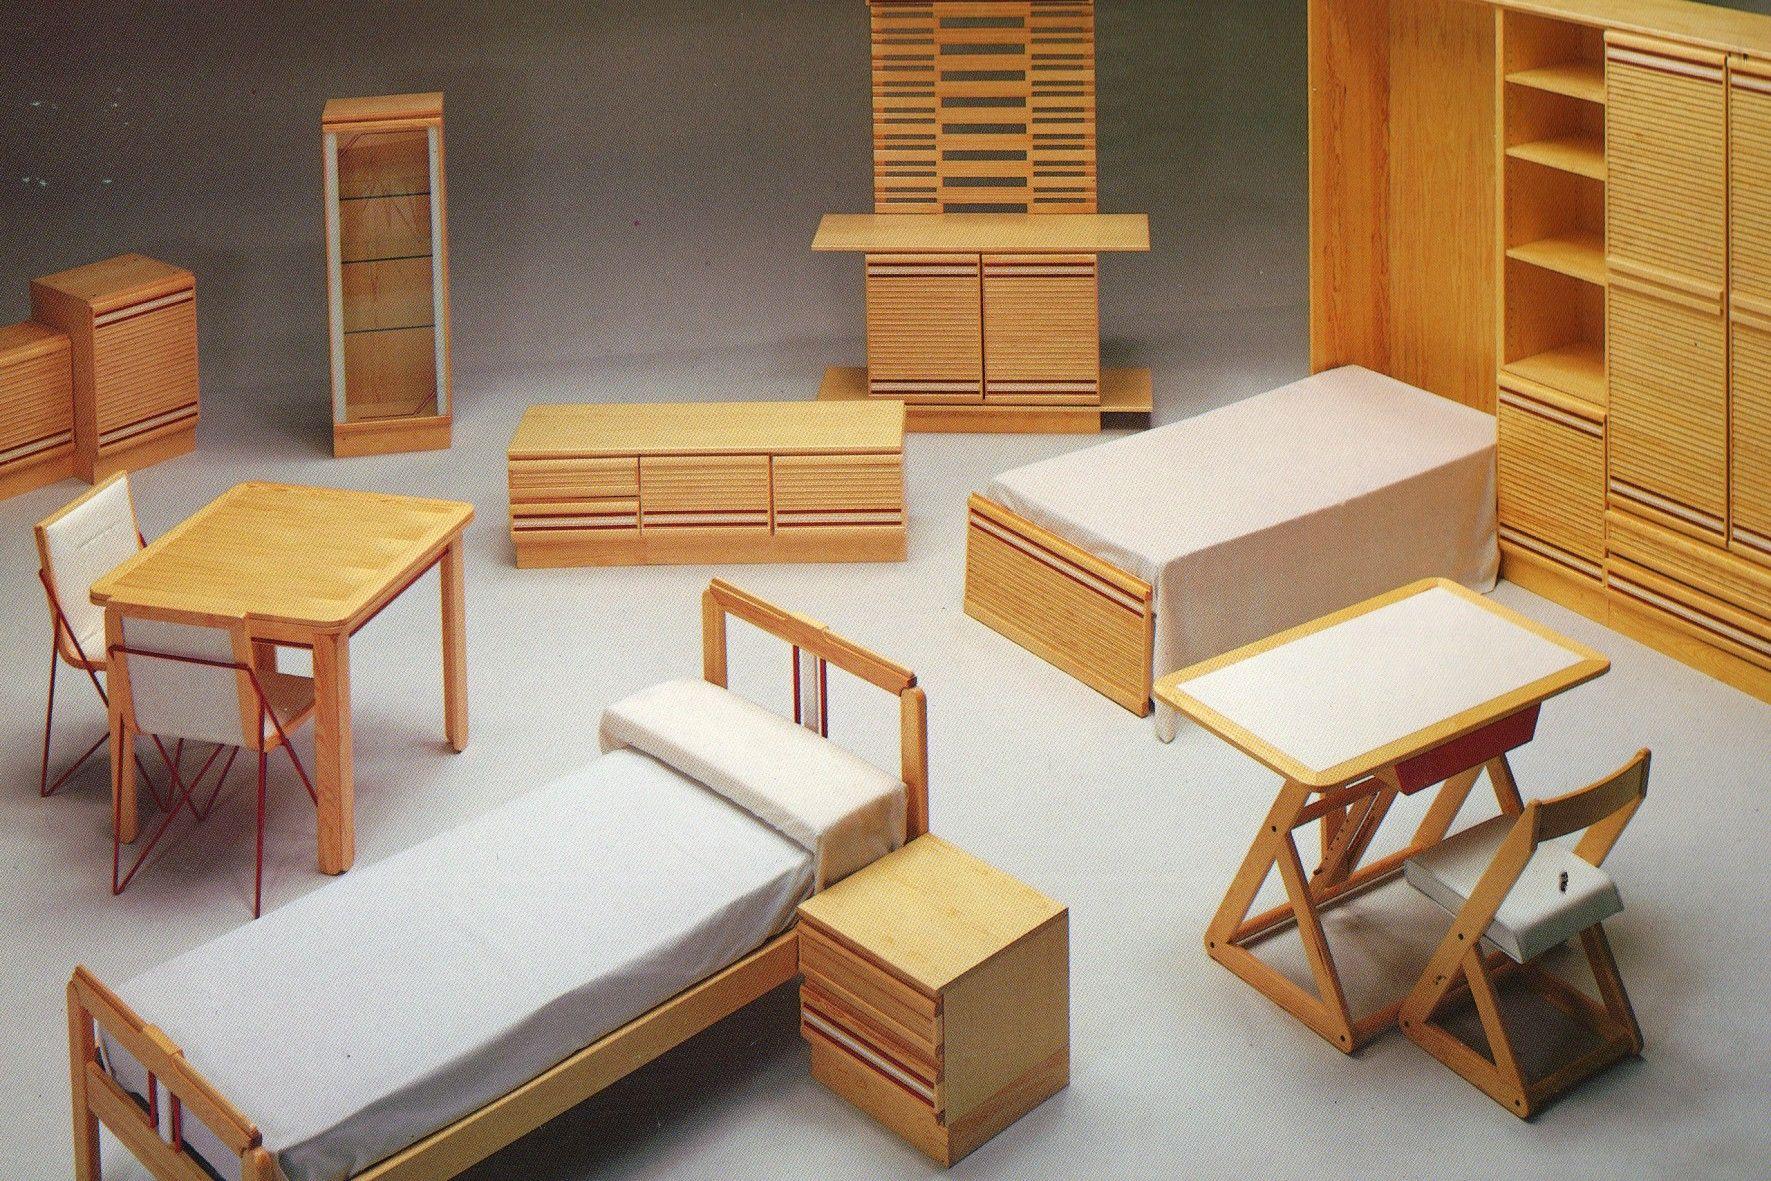 Dise o industrial programa juvenil halley majadas for Aplicacion para disenar muebles